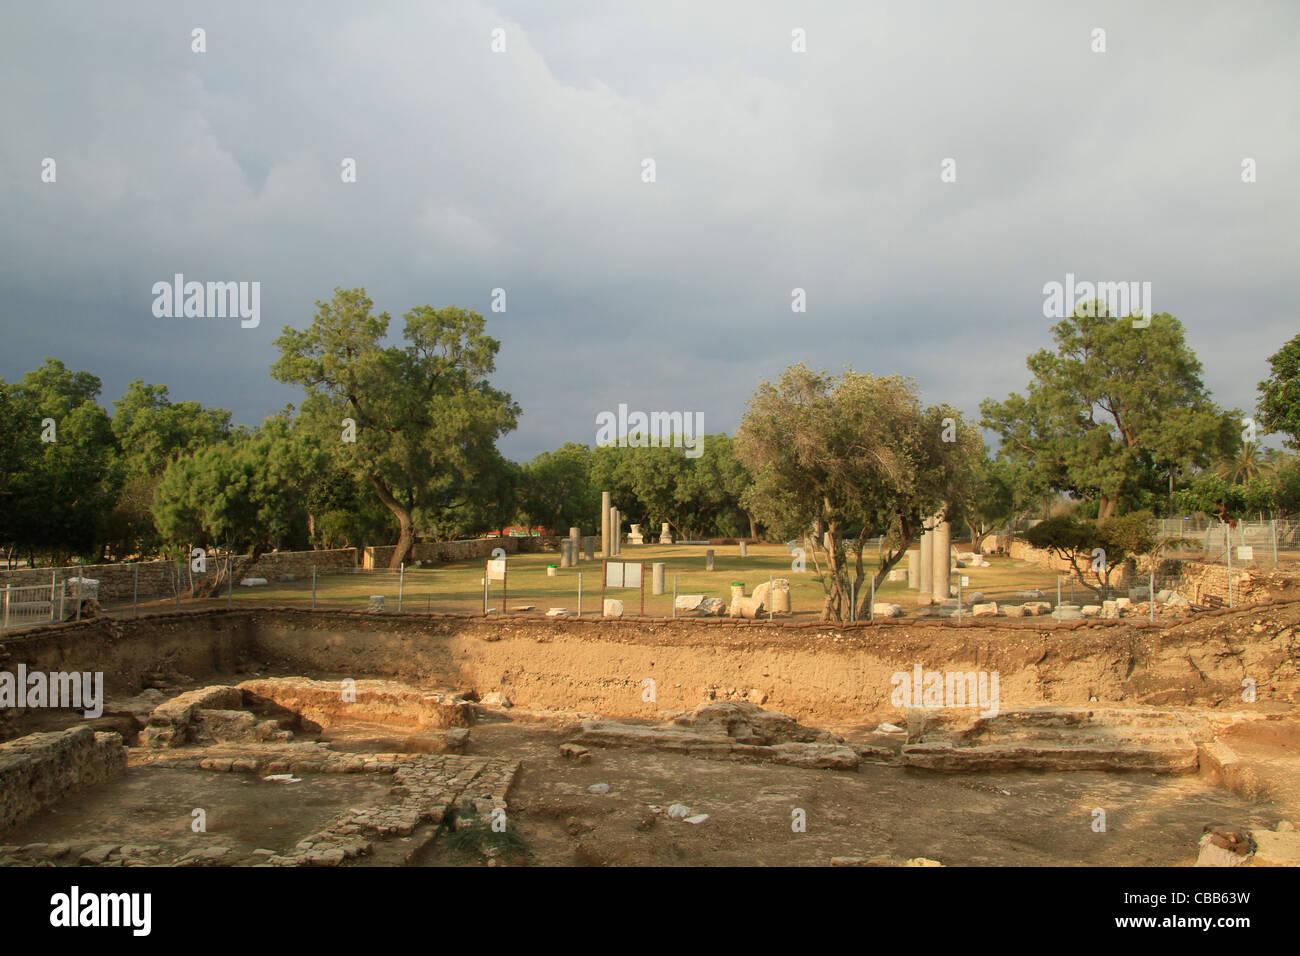 Israel, Coastal Plain, archaeological excavations in Ashkelon, site of the Herodian Basilica - Stock Image